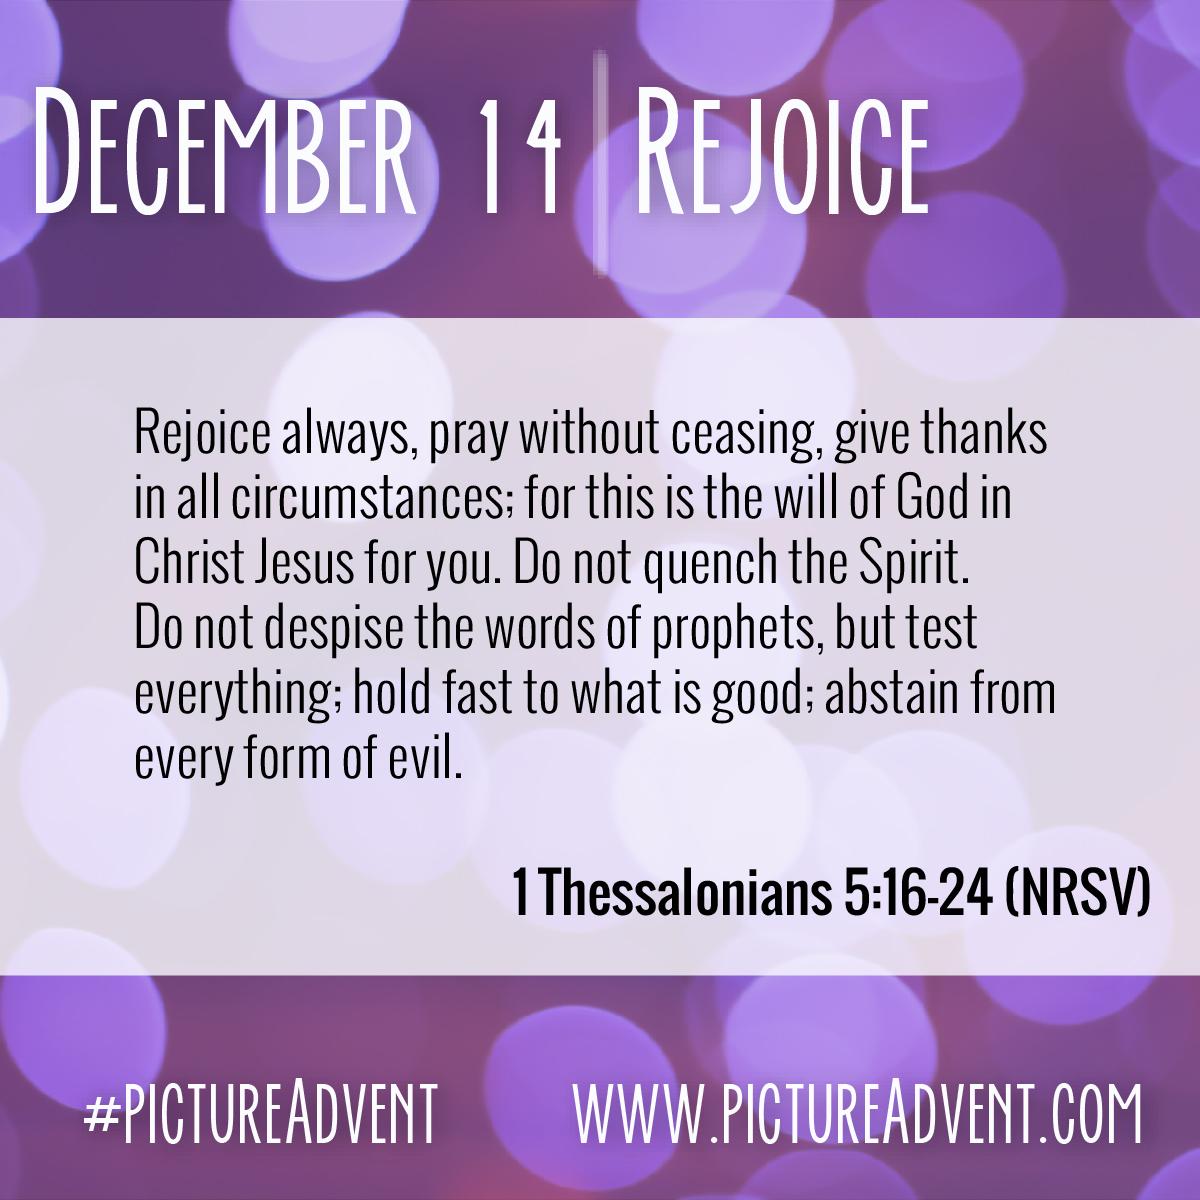 12 Dec 14 Rejoice-01.jpg